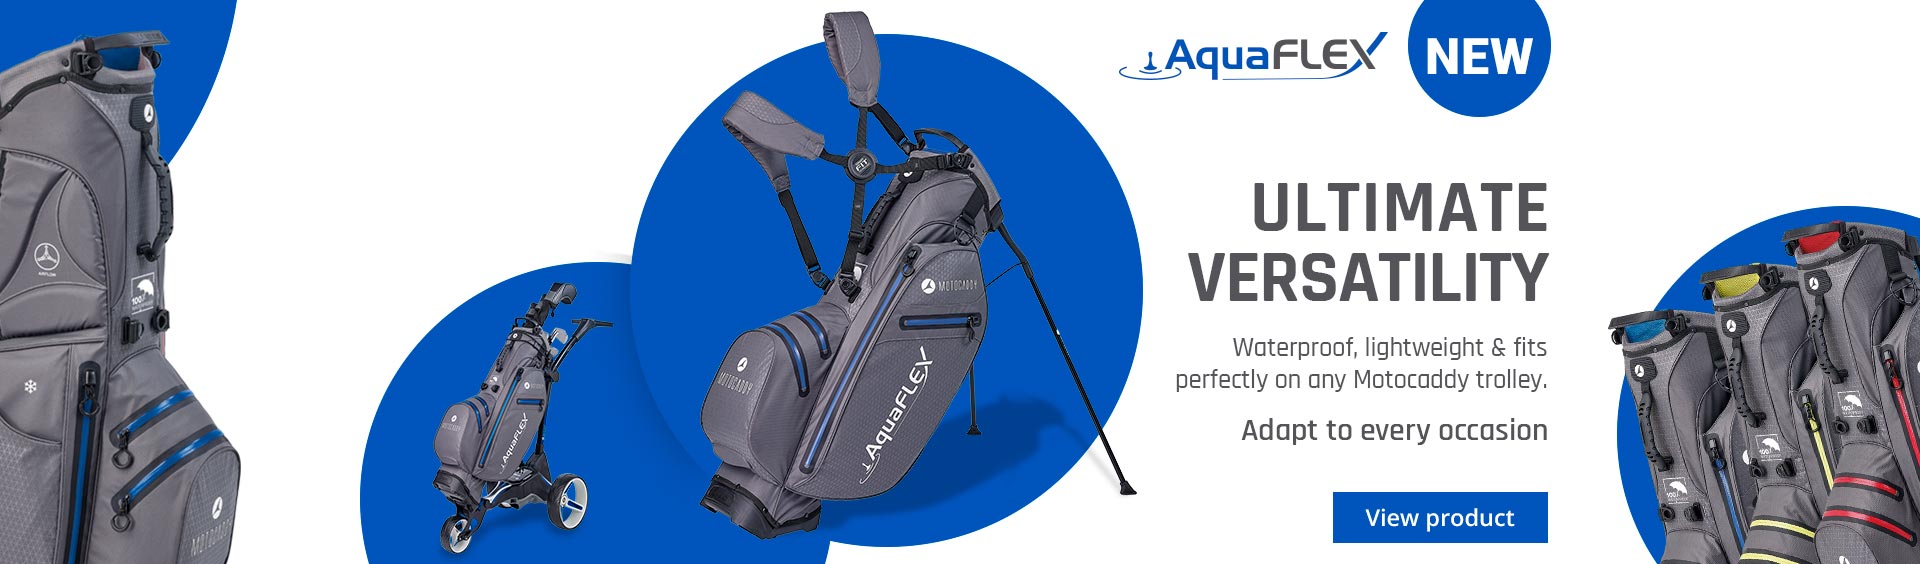 NEW AquaFLEX Stand Bag